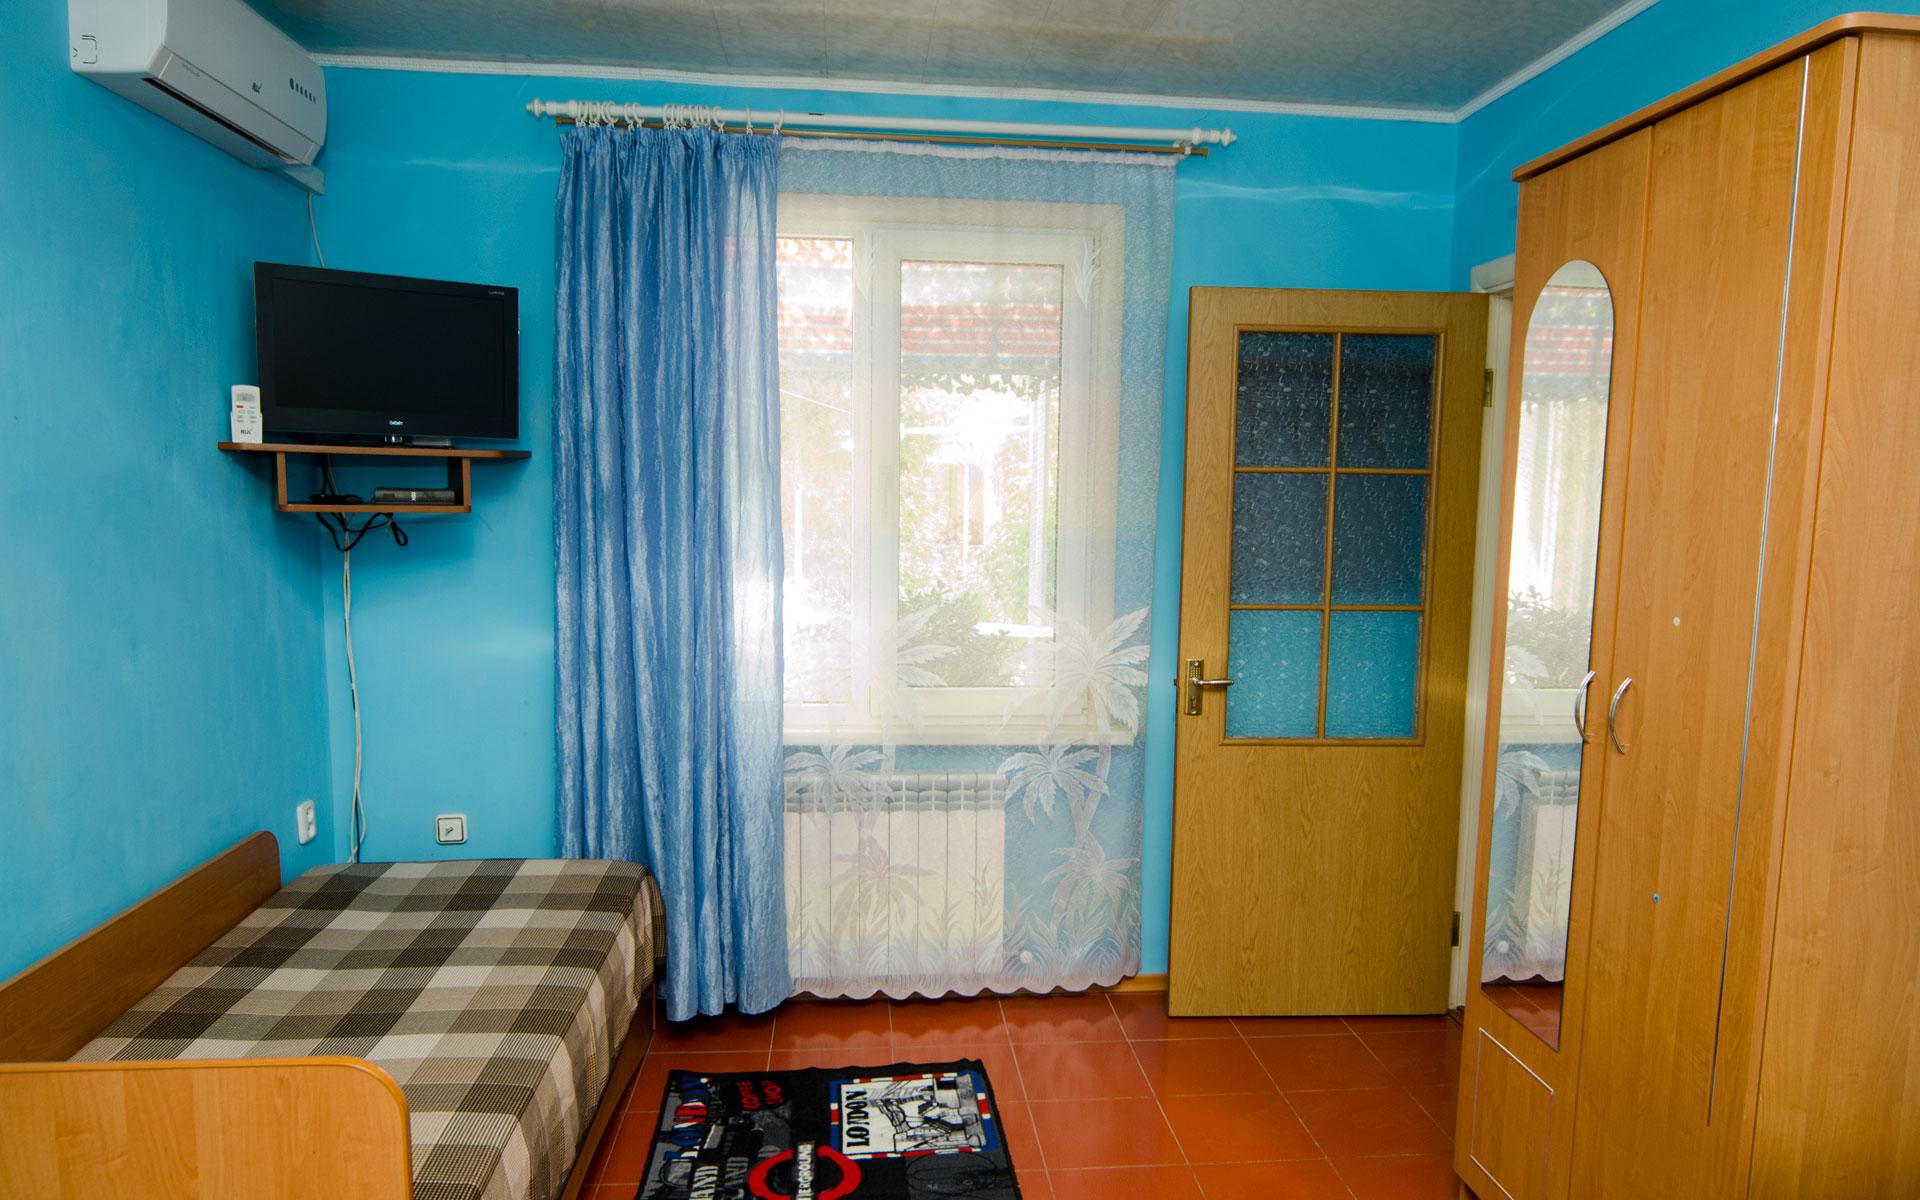 Комната. Квартира 1. 2 квартиры на ул. Гайдара. Заозёрное